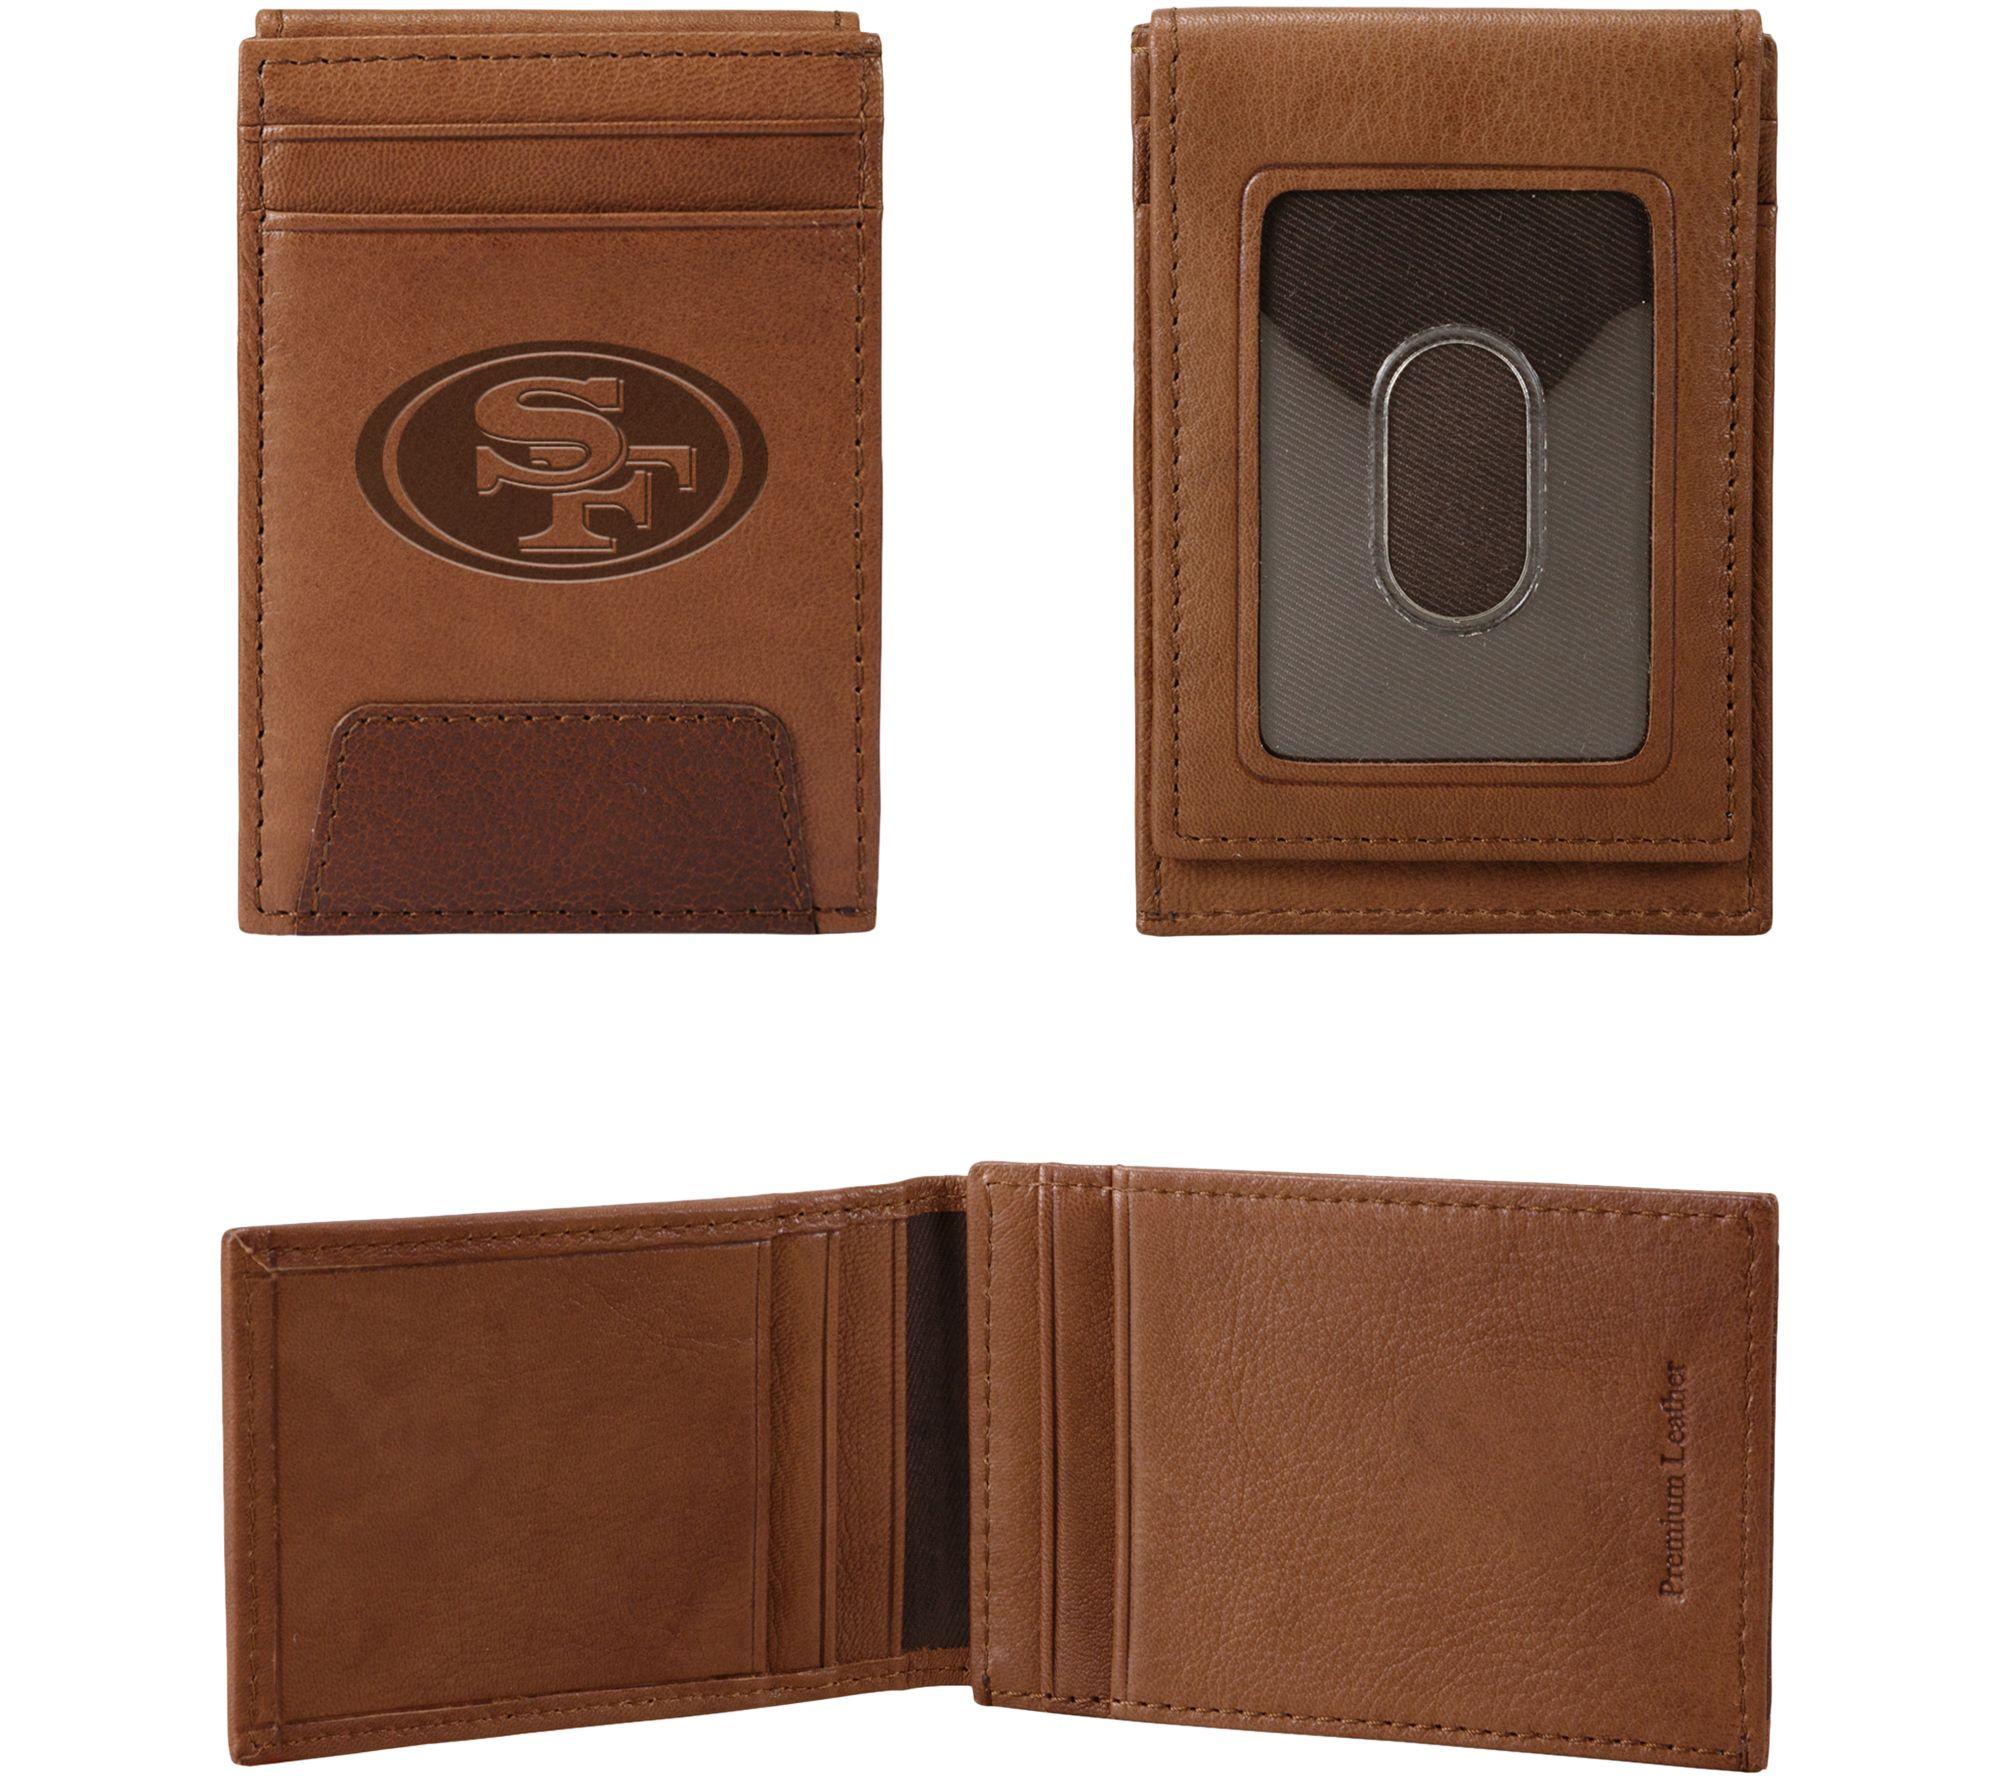 Rico NFL Mens NFL Tri-Fold Leather Wallet Brown